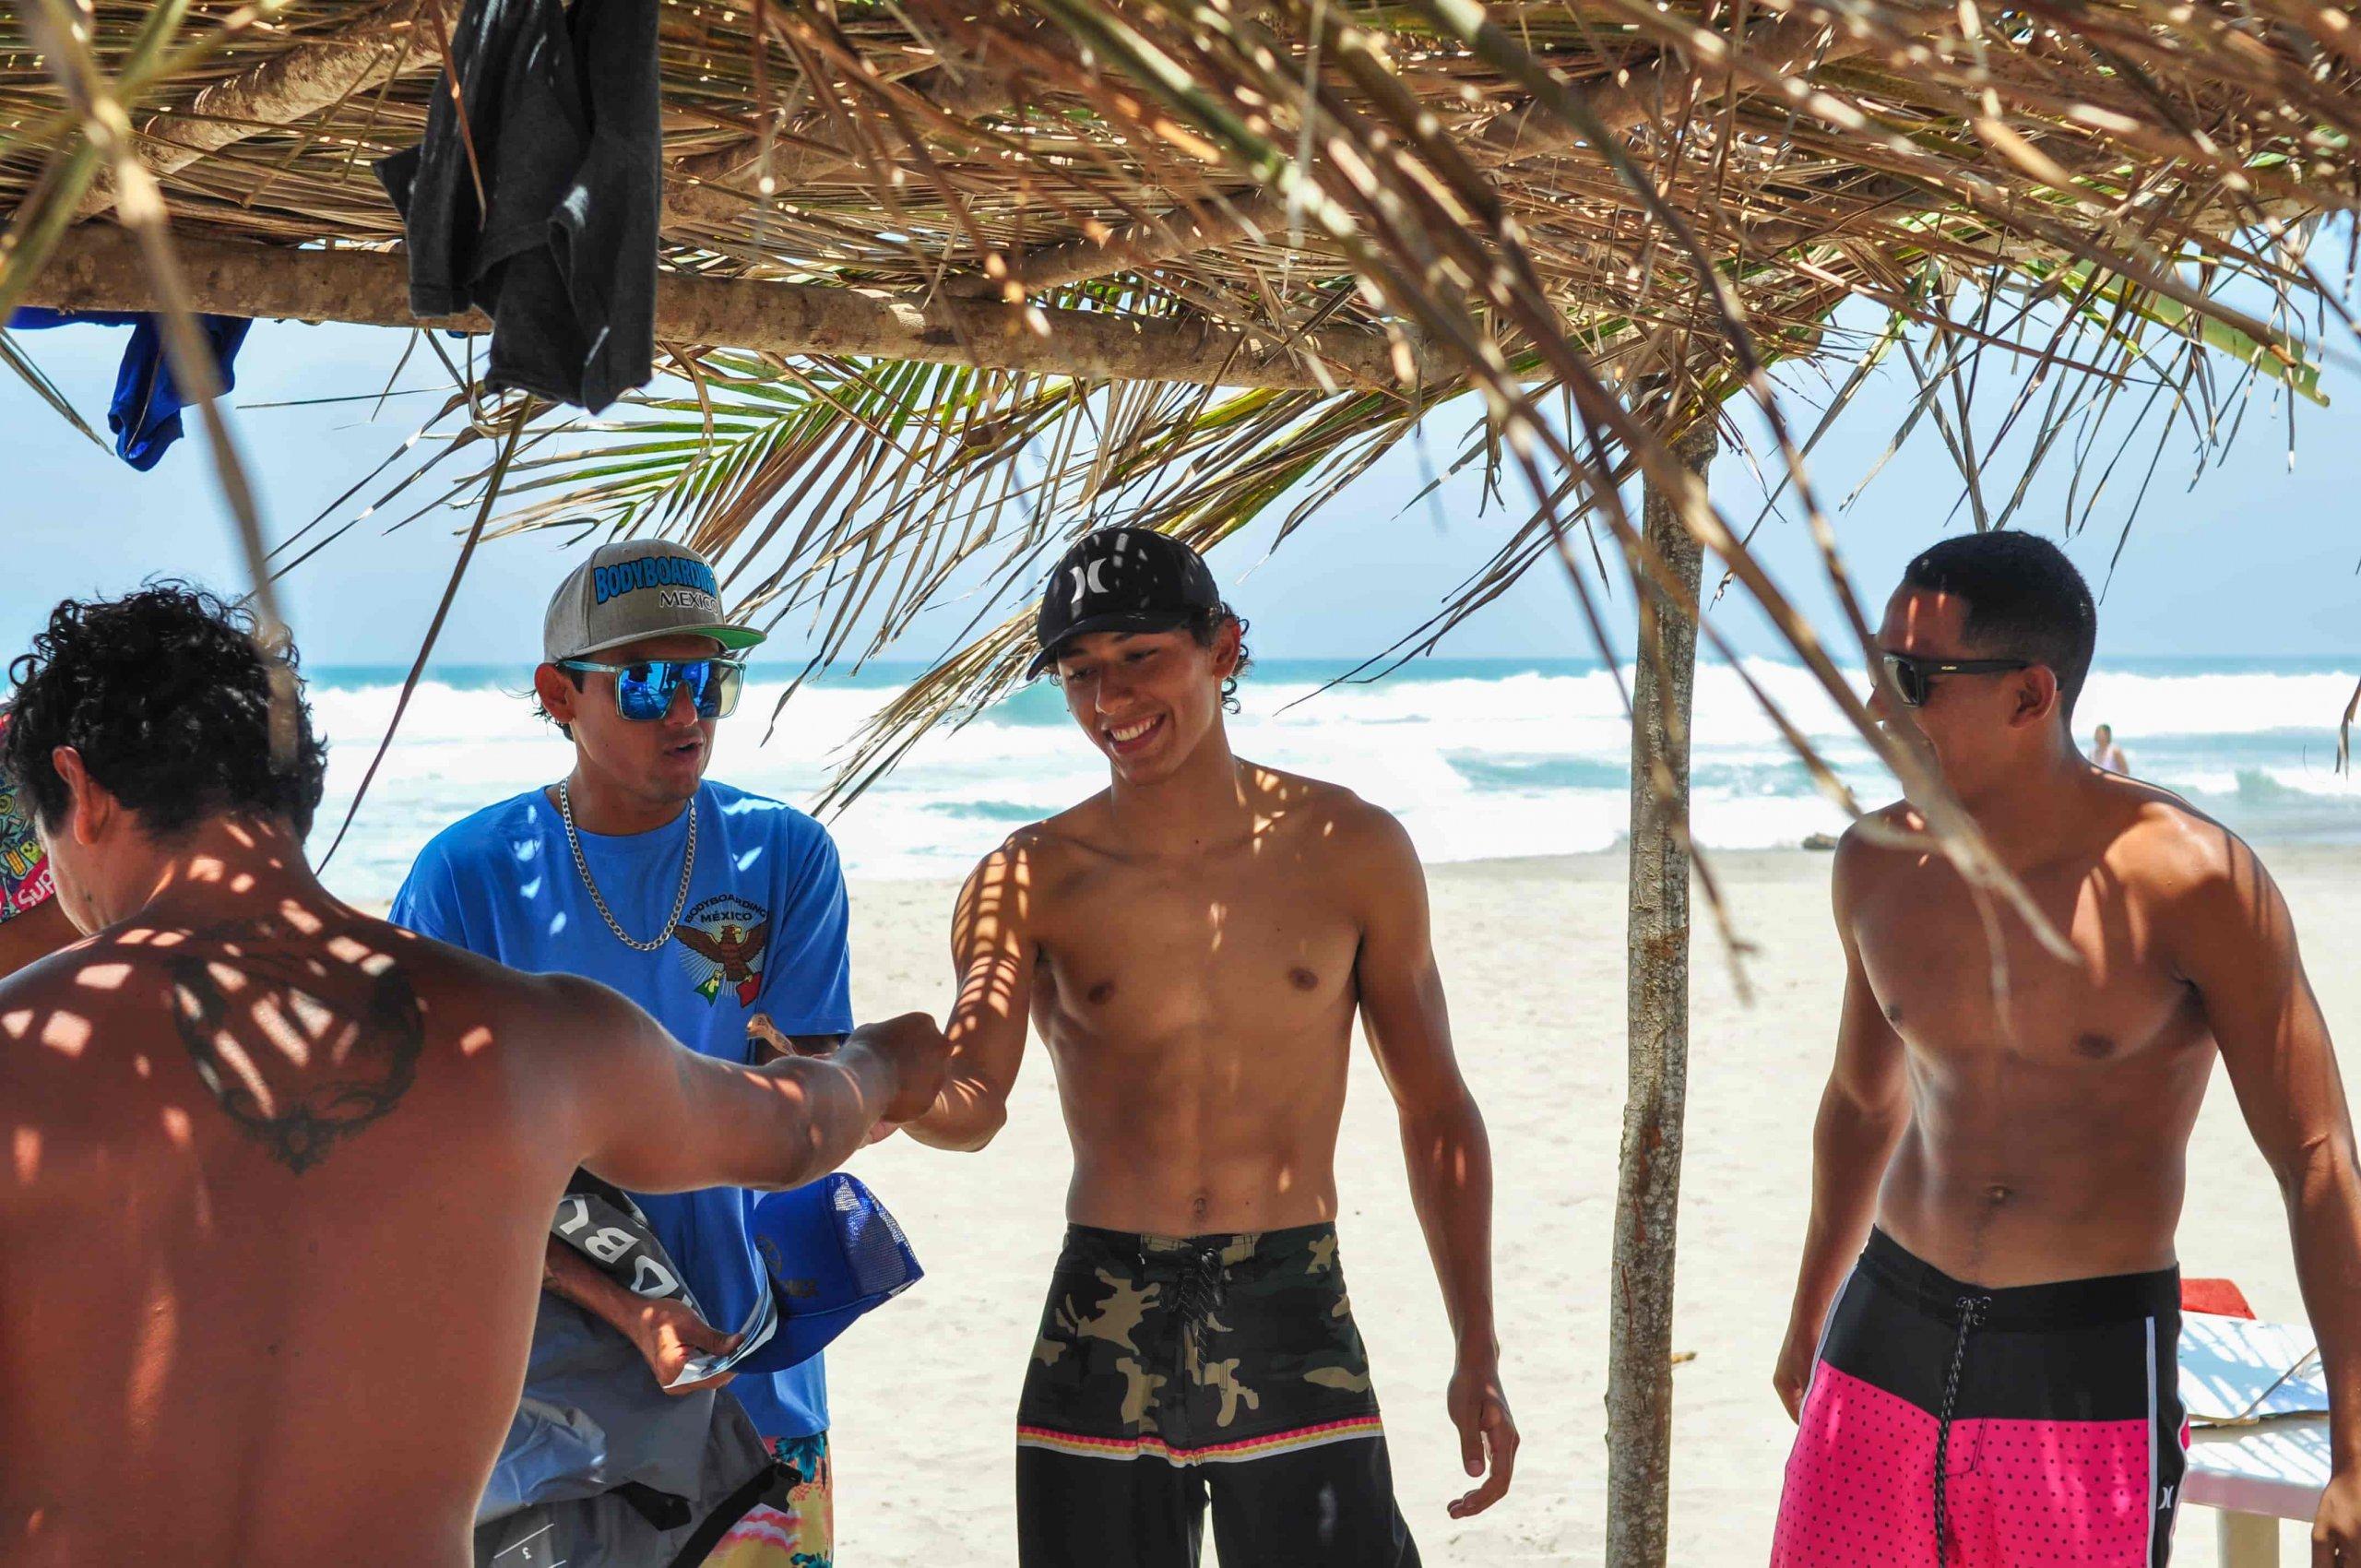 torneo bodyboard tournament discover troncones saladita majahua mexico playa reservaciones hospedaje ixtapa guerrero travel near me booking hotel cheap hotel